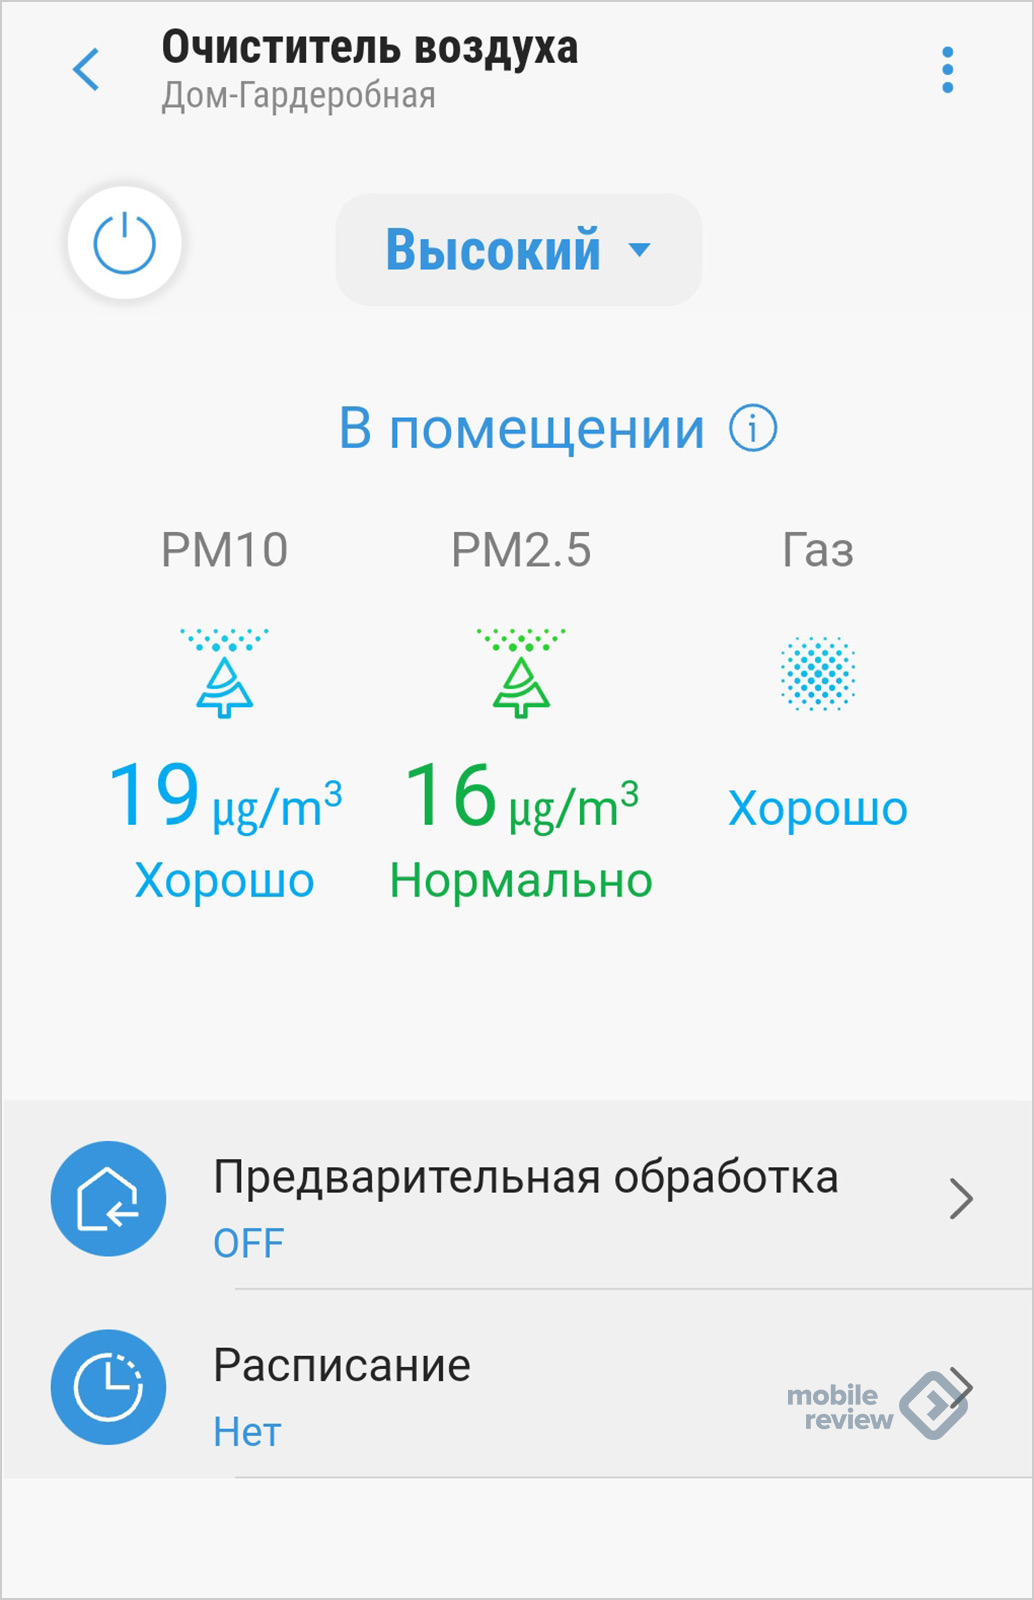 Обзор очистителя воздуха SamsungAX9500 Windfree